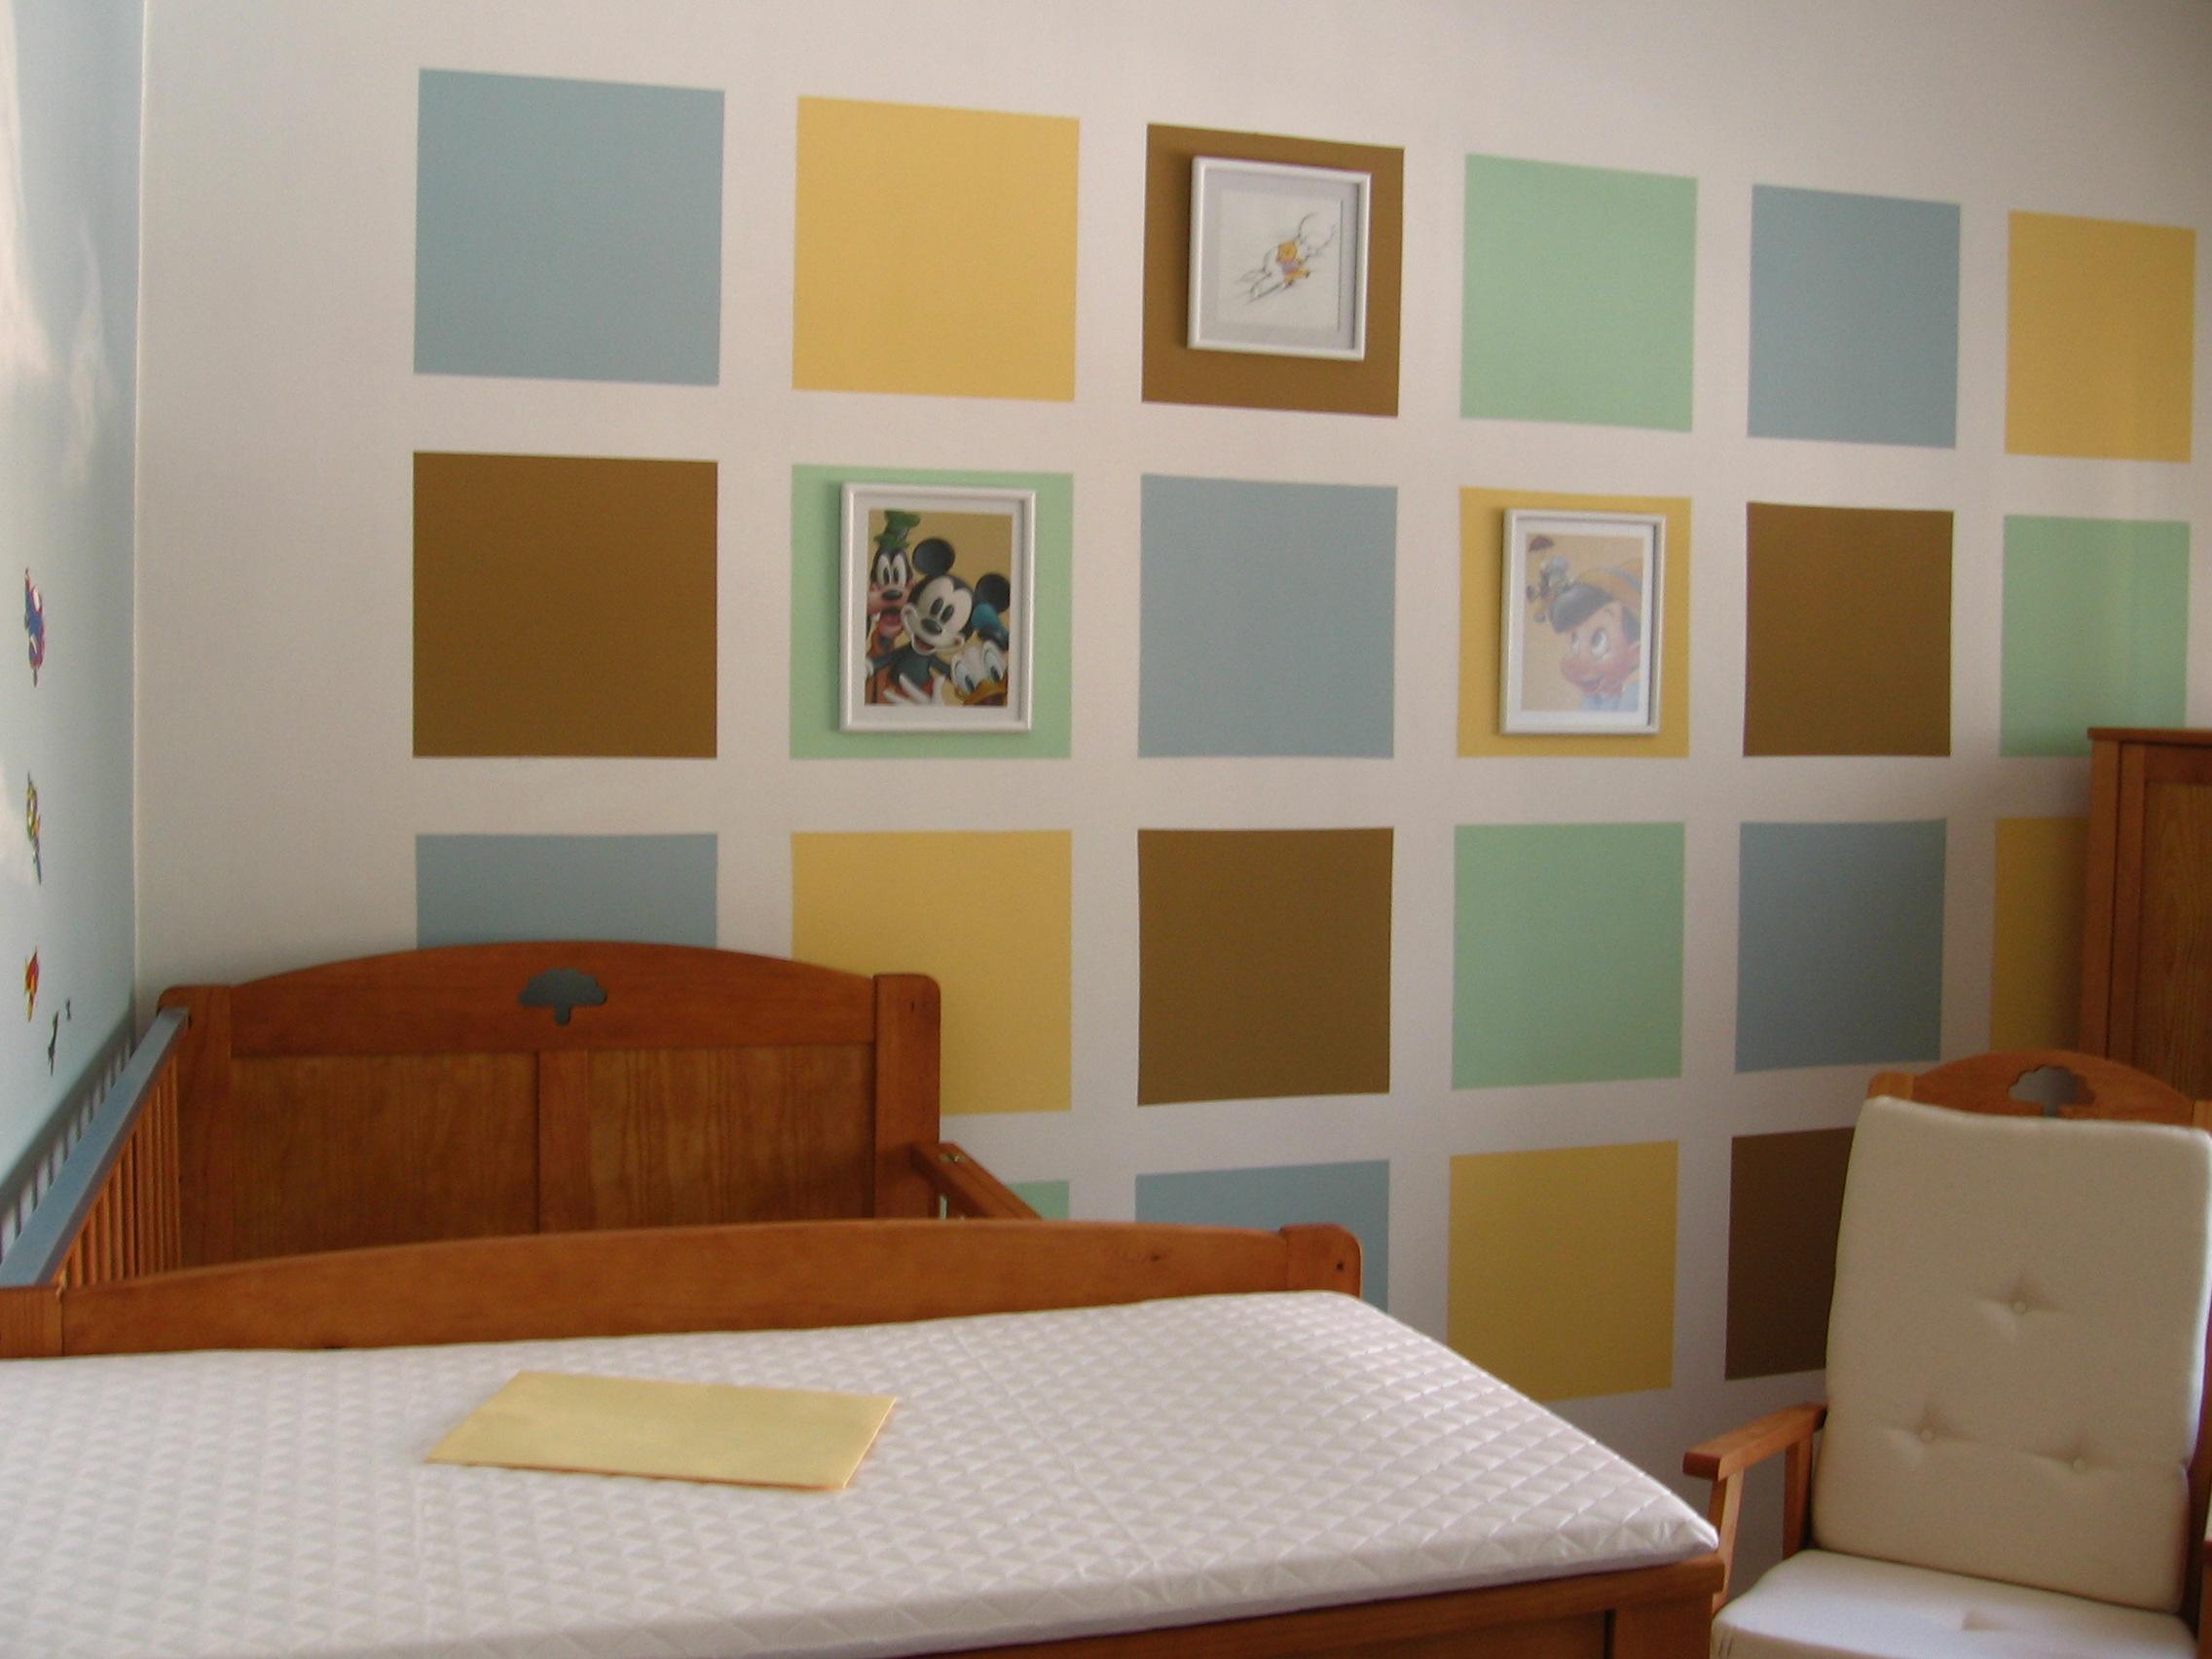 Diseno de habitacion infantil by alejandra hernandez at - Diseno habitacion infantil ...